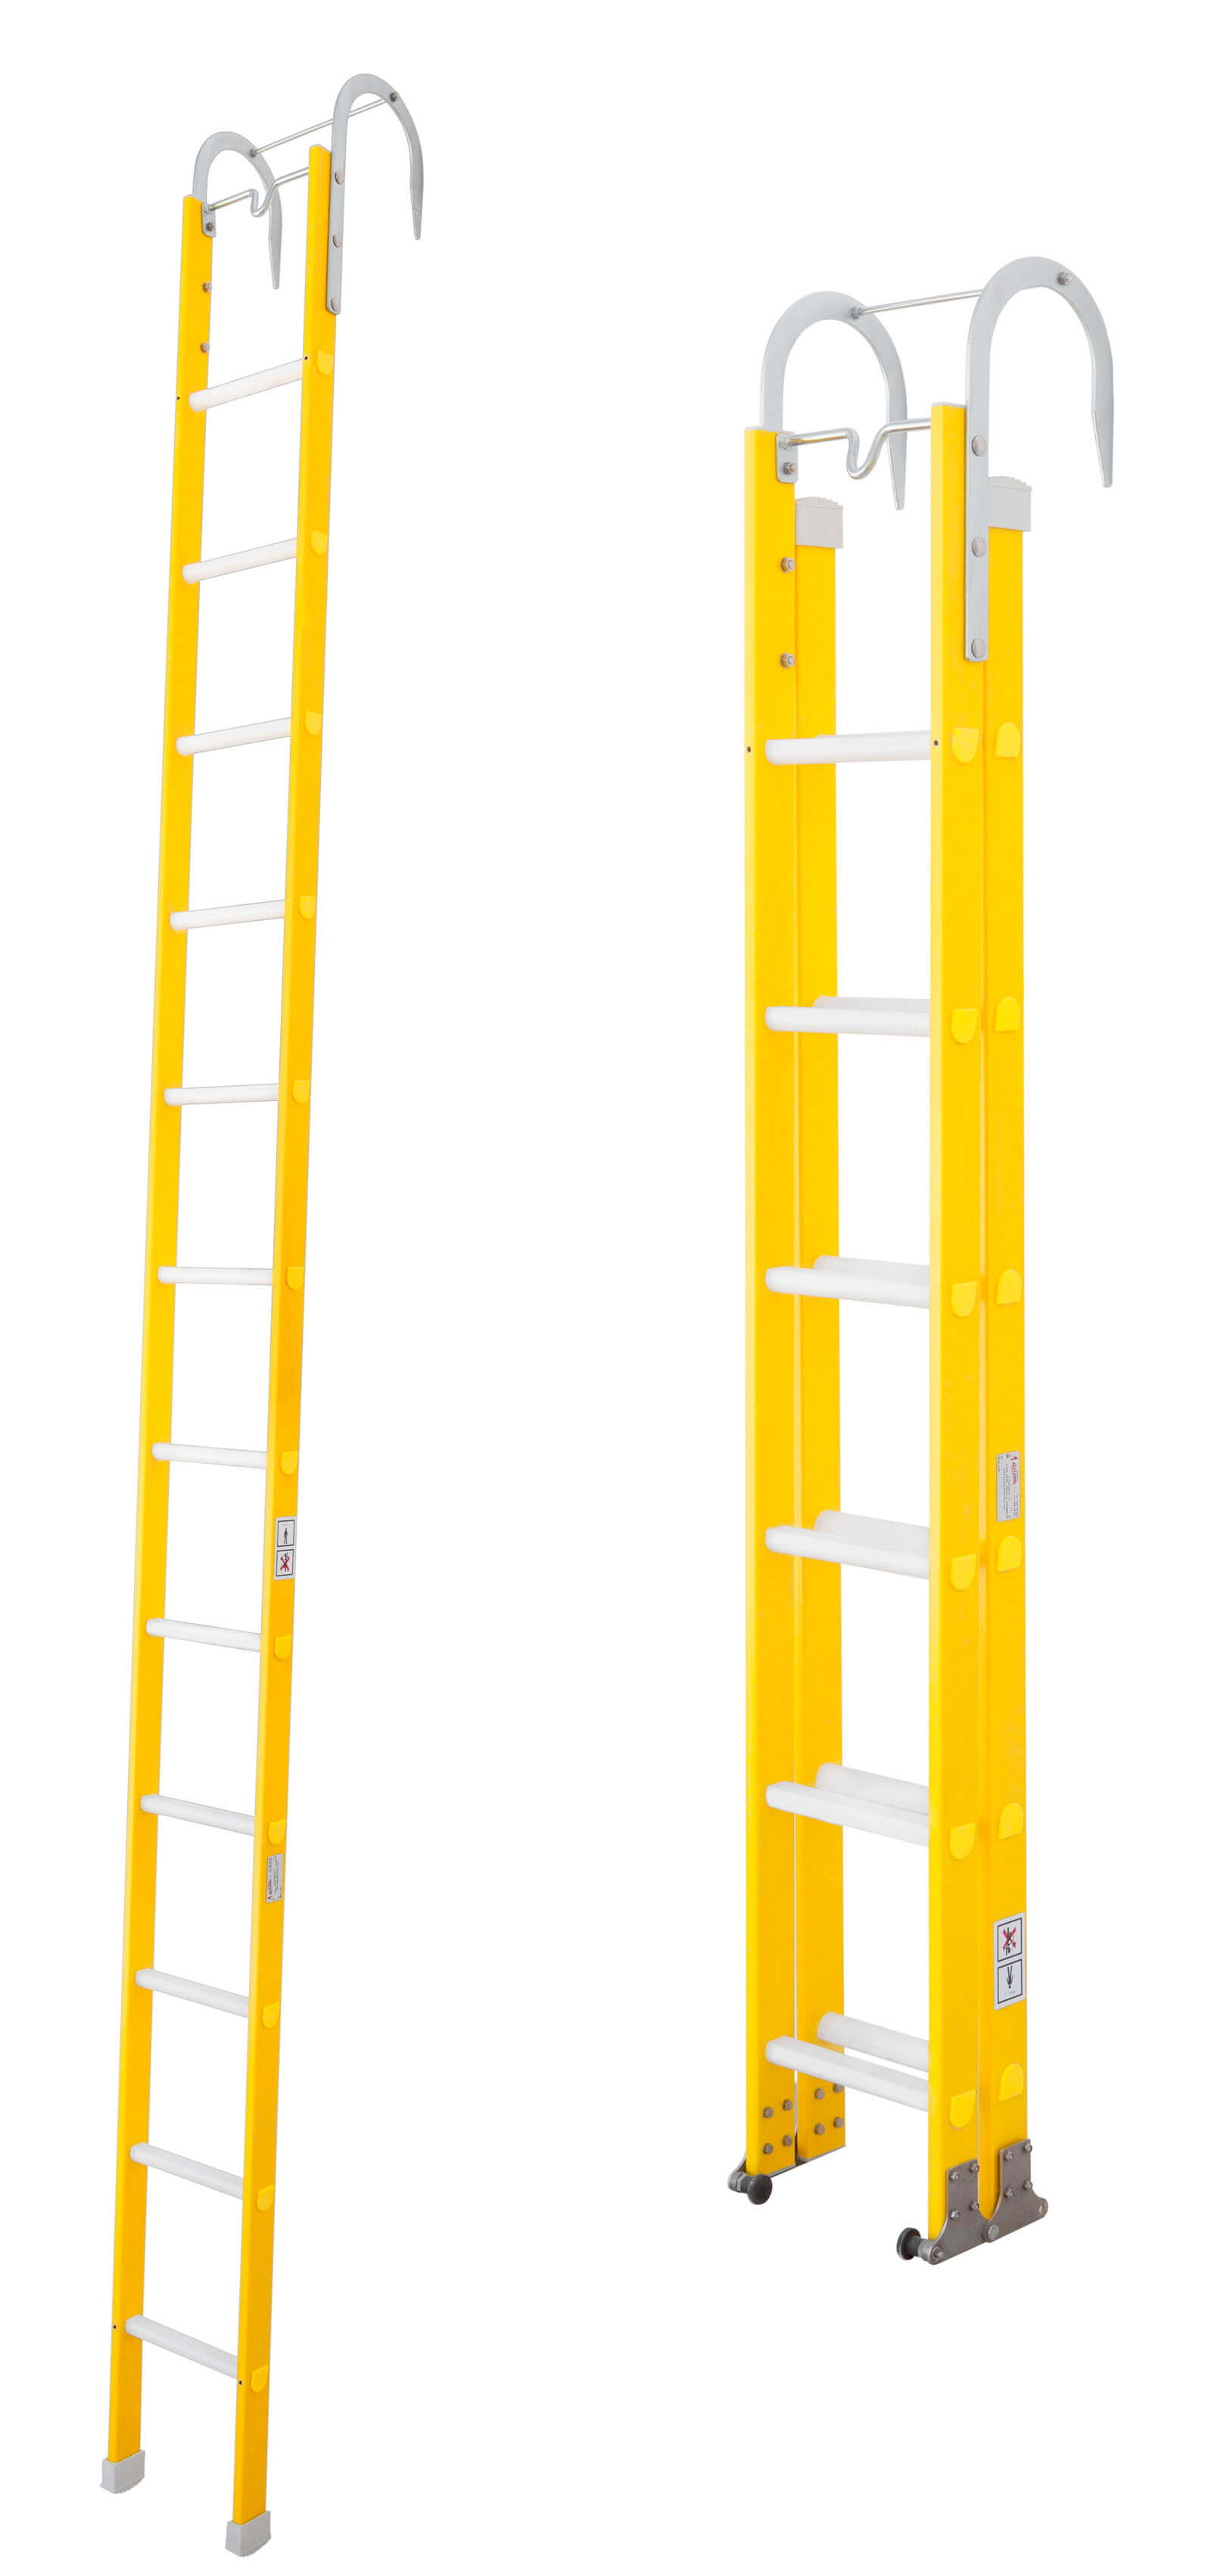 Escalera De Asalto Para Uso Contra Incendios